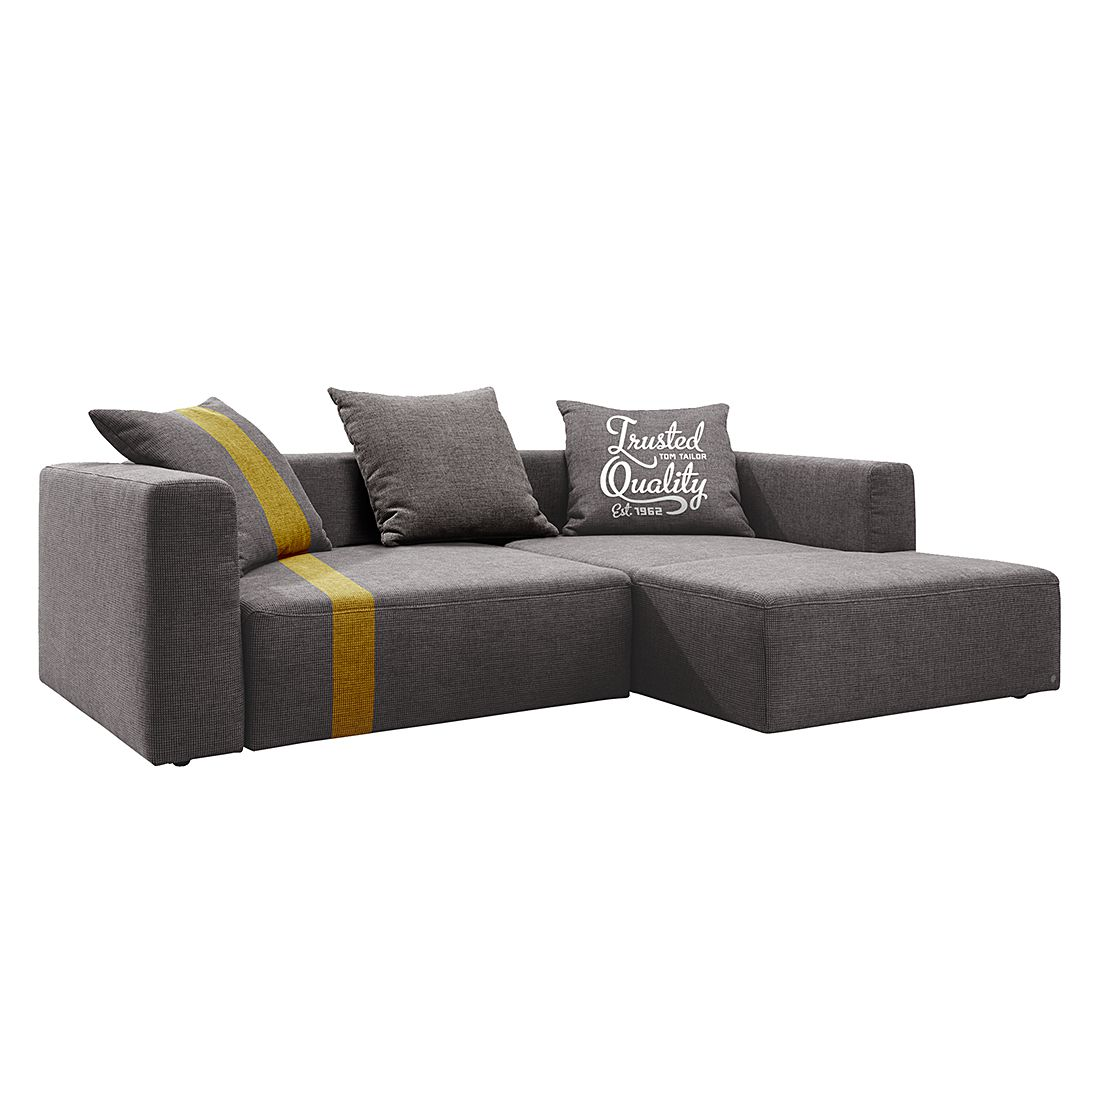 home24 Tom Tailor Ecksofa Heaven Stripe Longchair 2-Sitzer Grau/Senfgelb Webstoff 242x66x162 cm